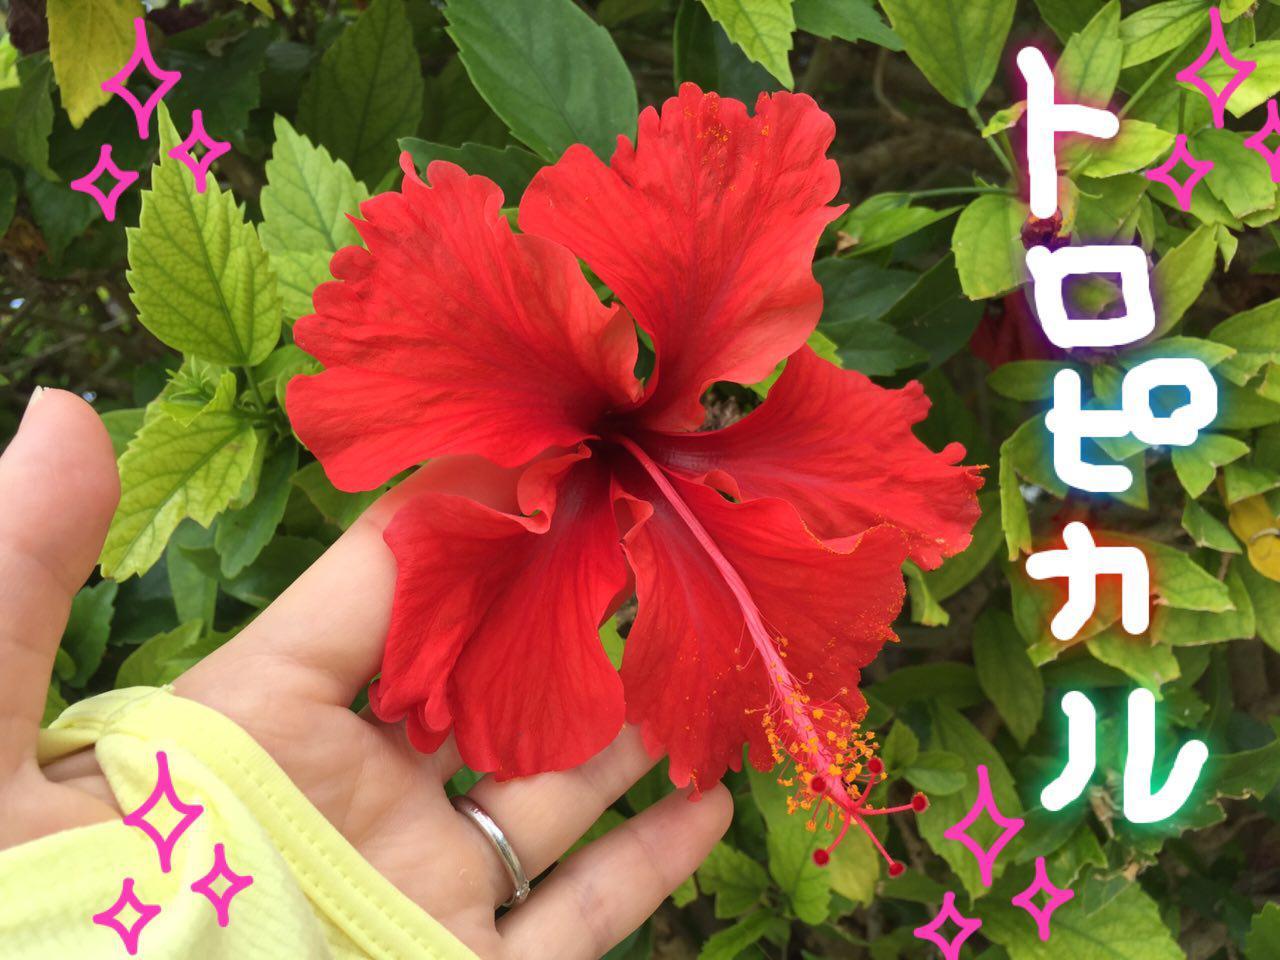 photo_2017-06-06_22-29-43.jpg